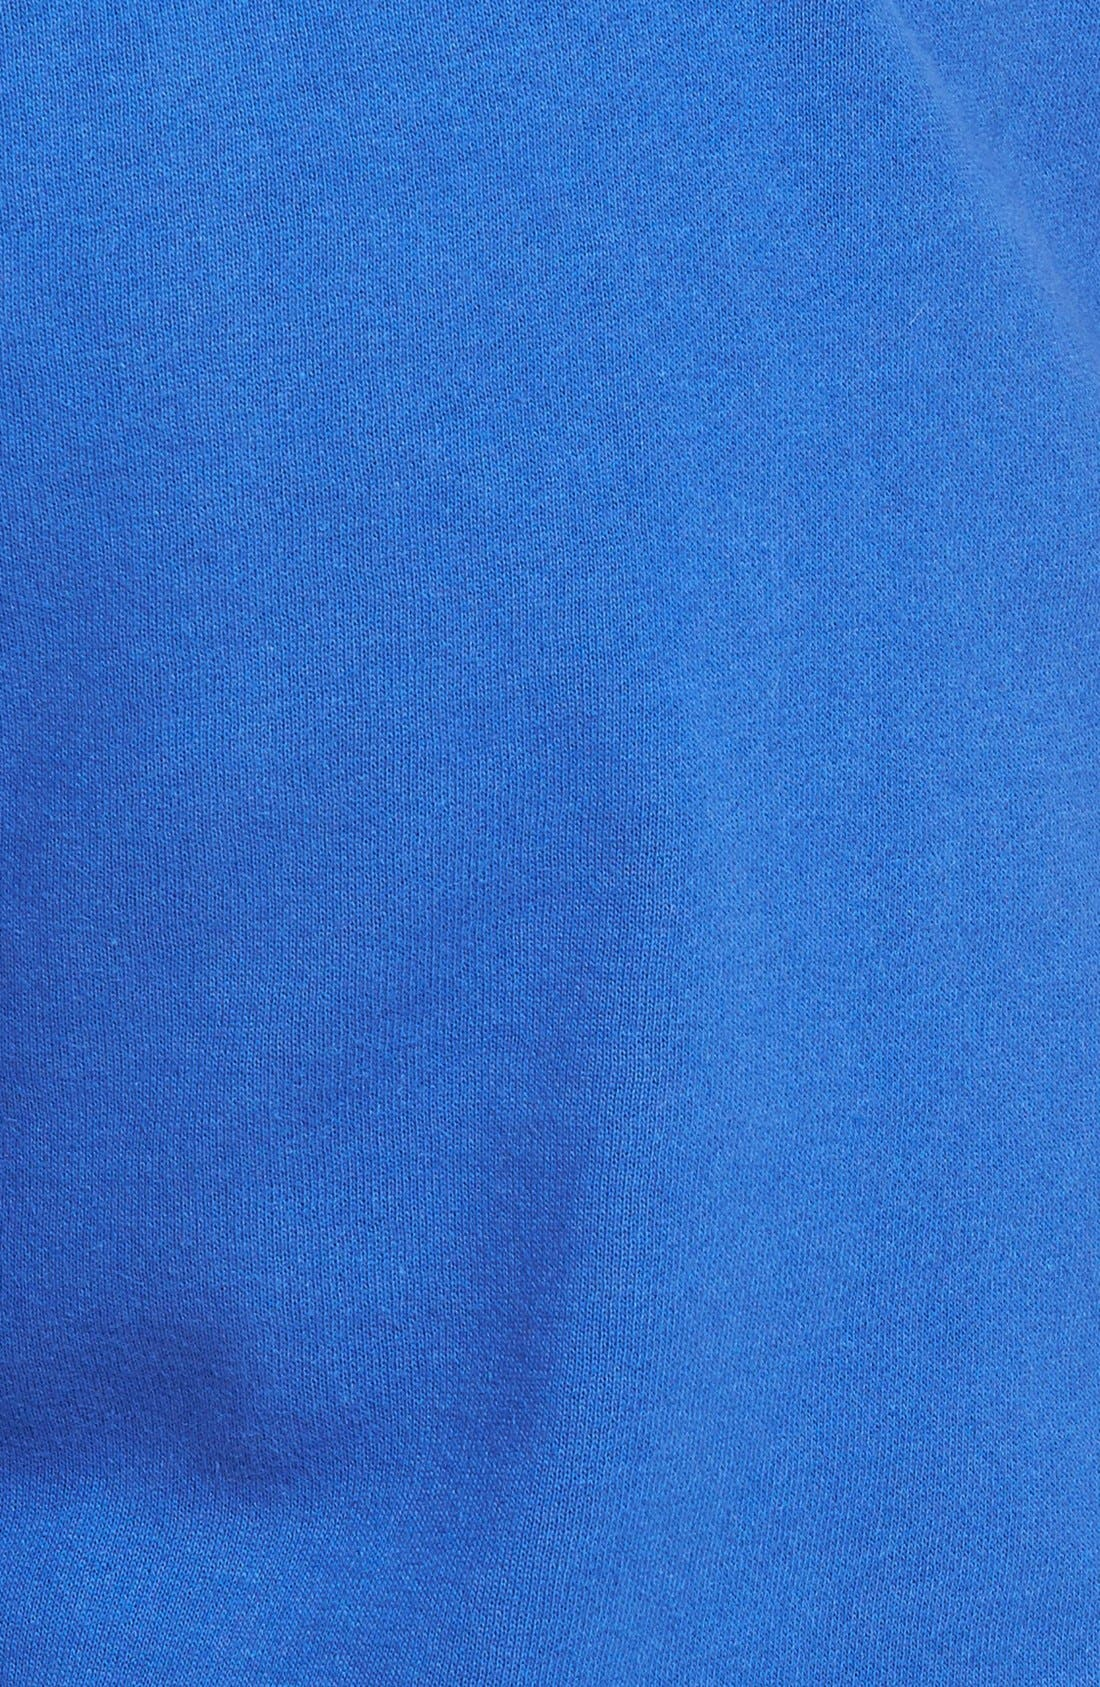 'New England Patriots' Fleece Sweatpants,                             Alternate thumbnail 2, color,                             430